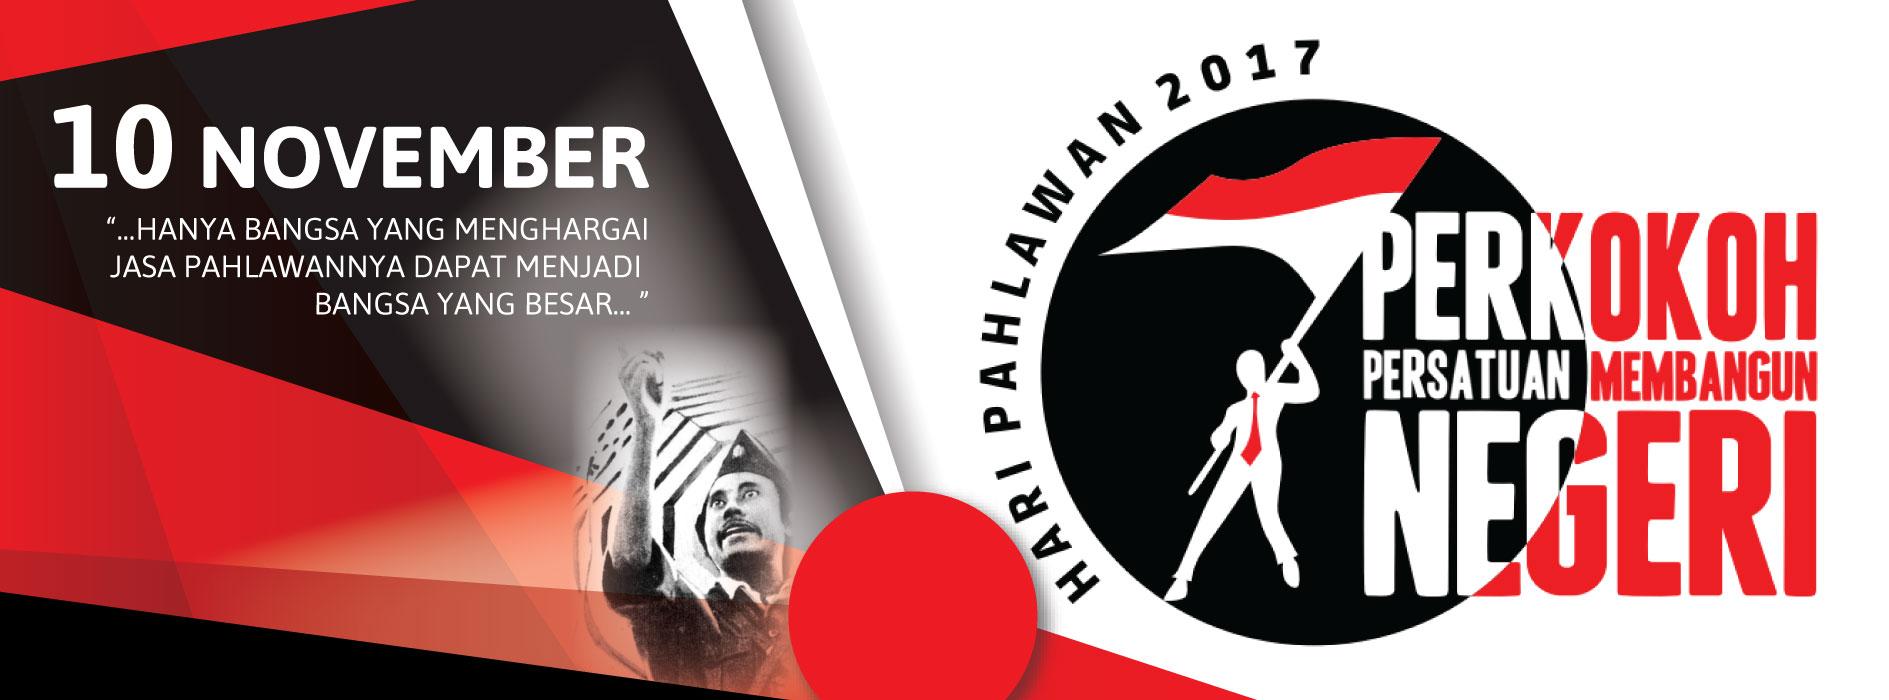 SEKOLAH TIRTAMARTA-BPK PENABUR PONDOK INDAH CINERE JAKARTA DEPOK INDONESIA, 10 NOVEMBER 2017 HARI PAHLAWAN